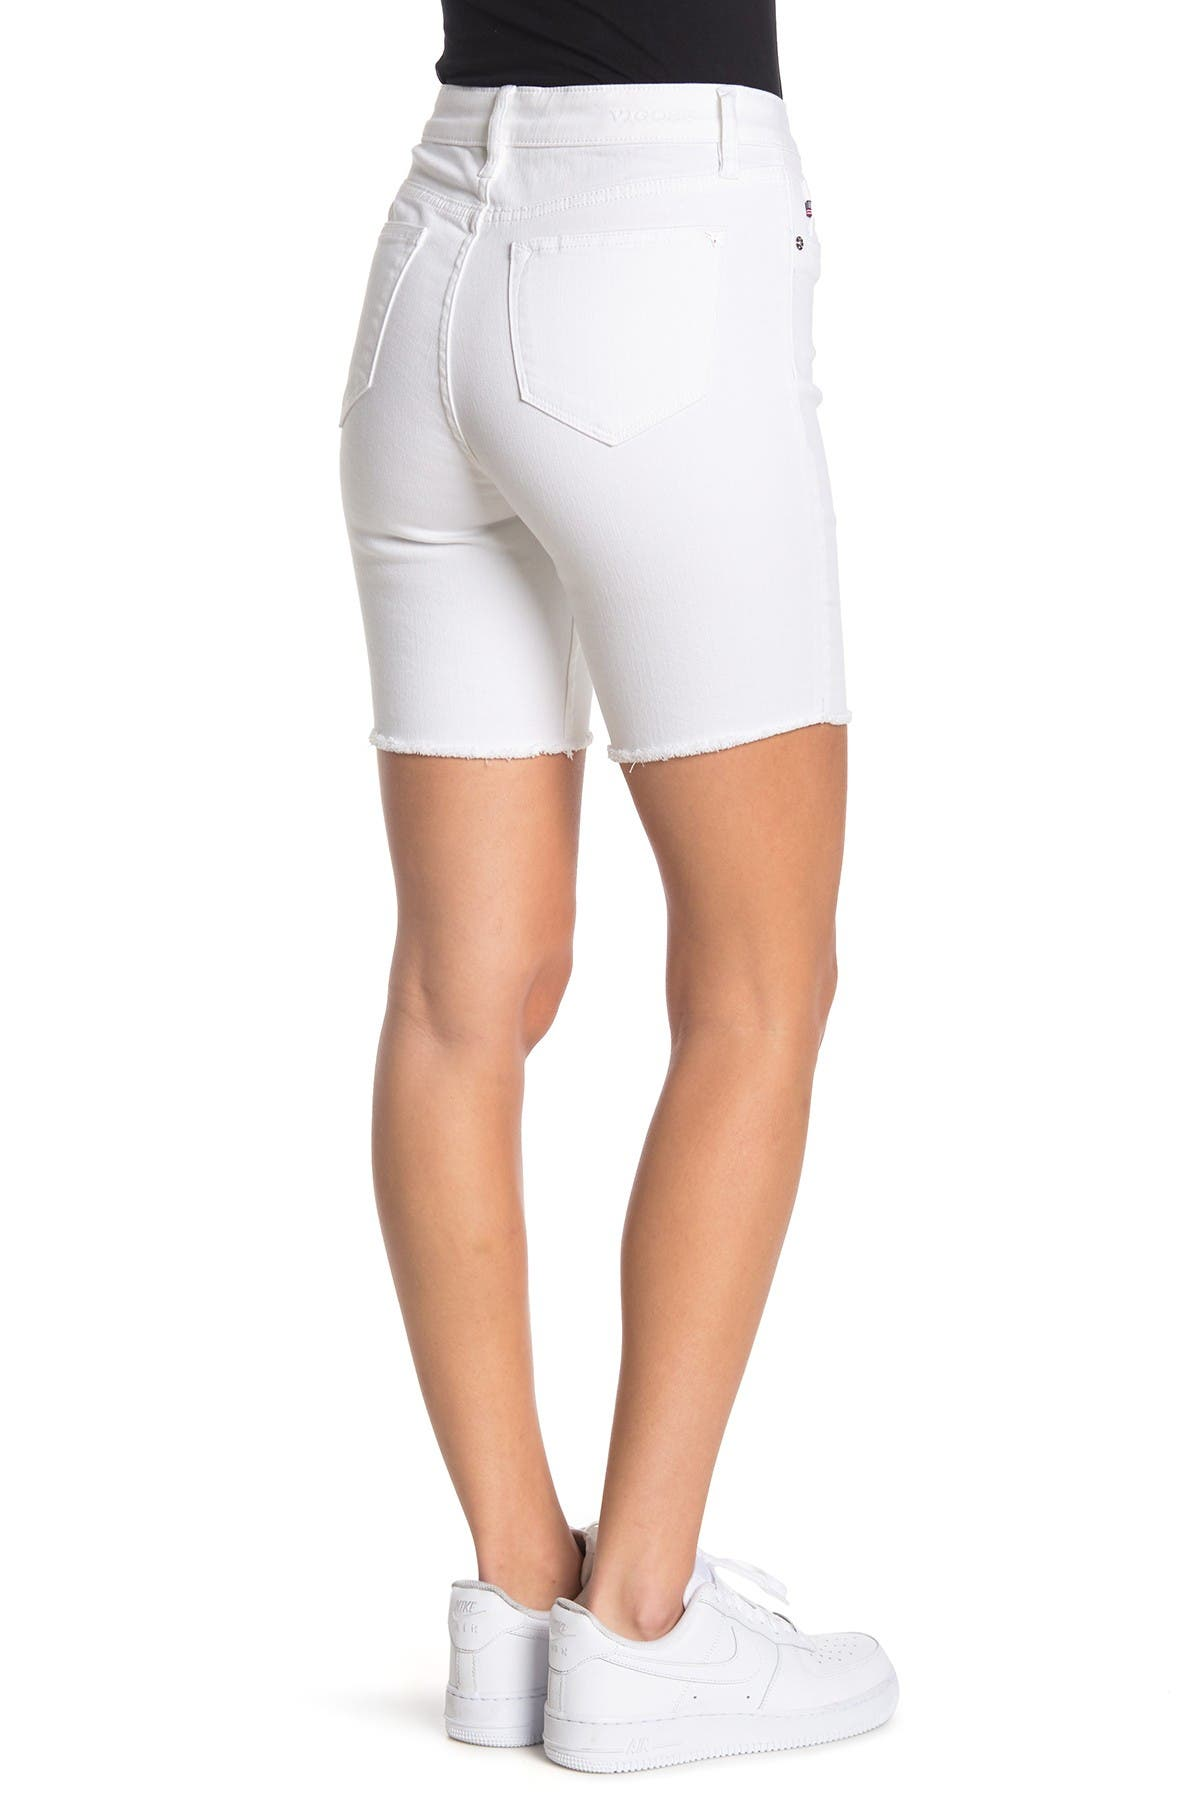 Image of Vigoss White Ace High Rise Bermuda Shorts